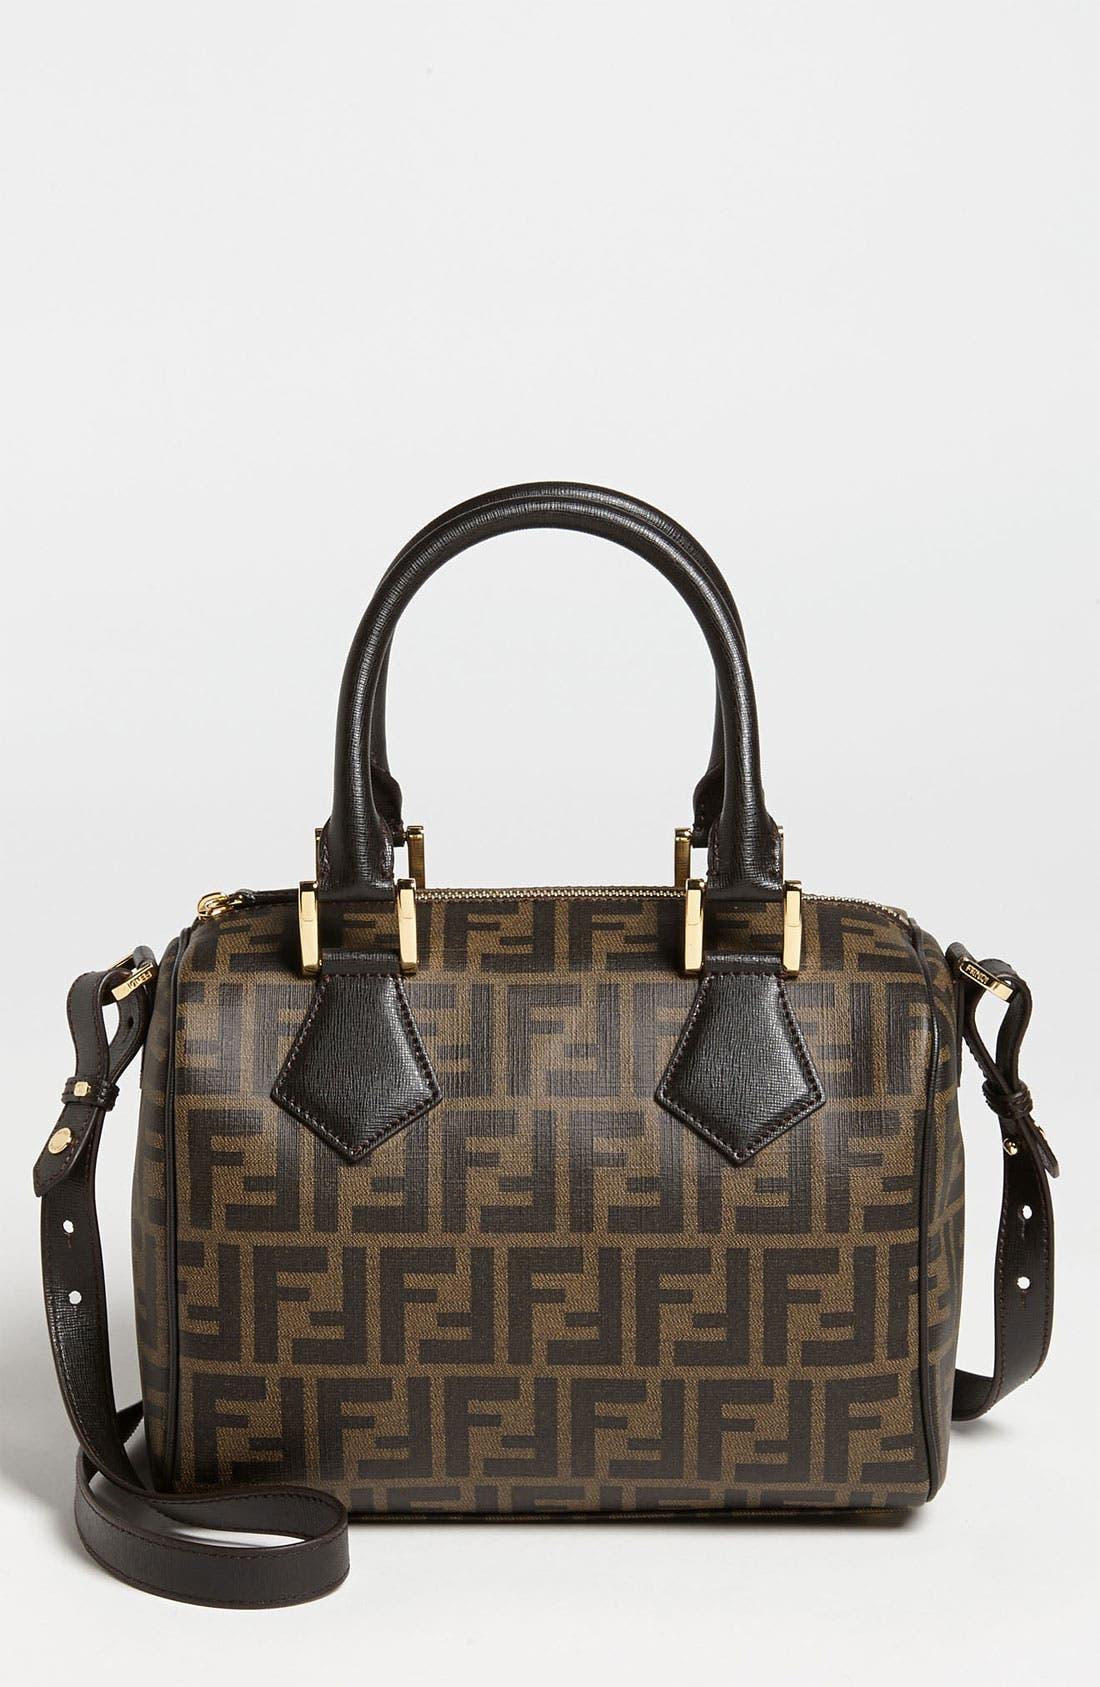 Alternate Image 1 Selected - Fendi 'Zucca - Small' Boston Bag